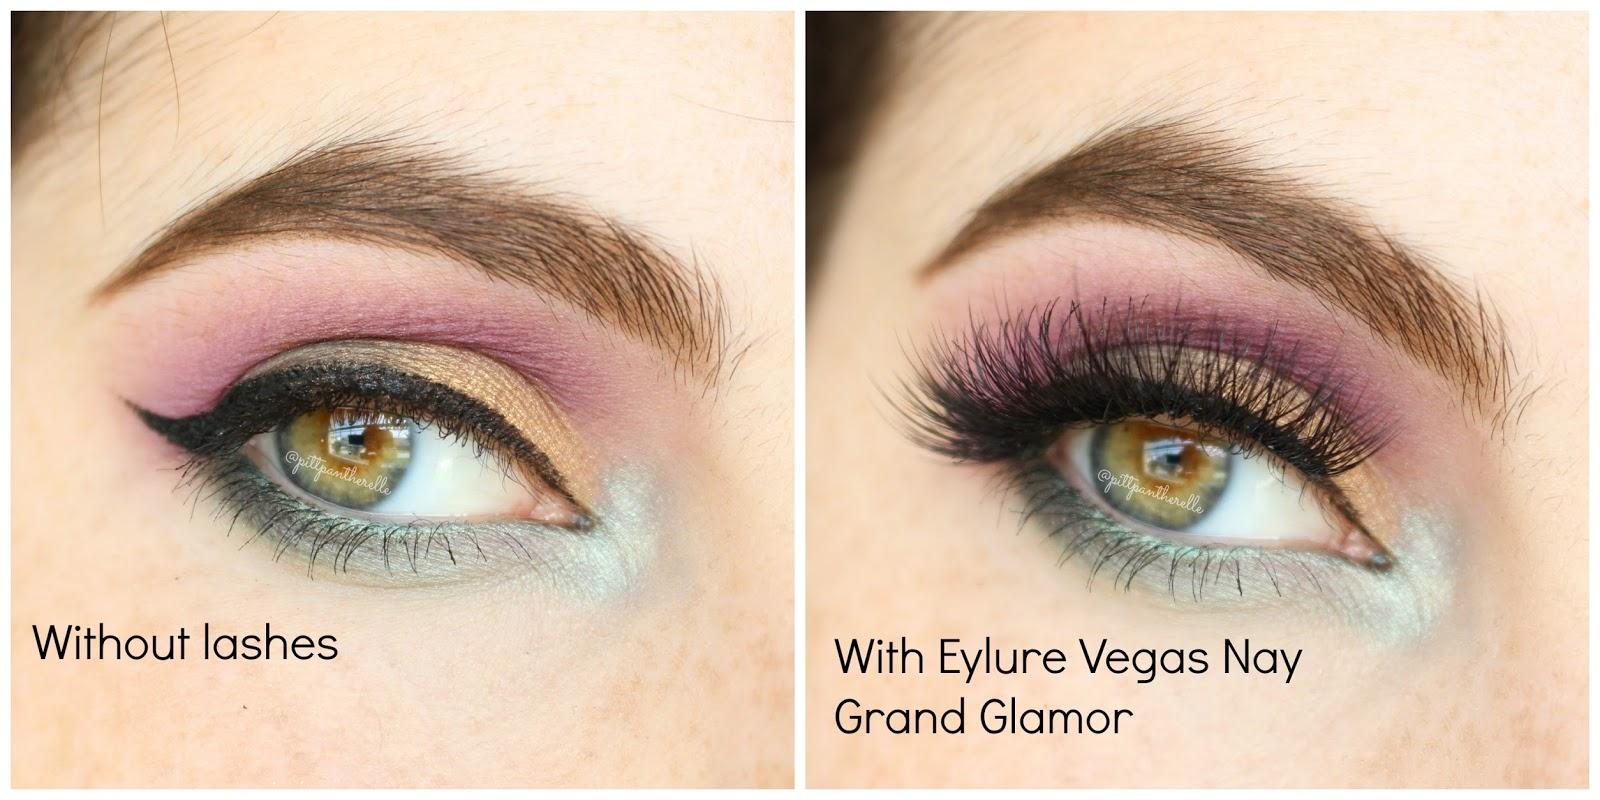 fdb92470065 PittPantherMUA: Review: Eylure Vegas Nay Lashes in Grand Glamor